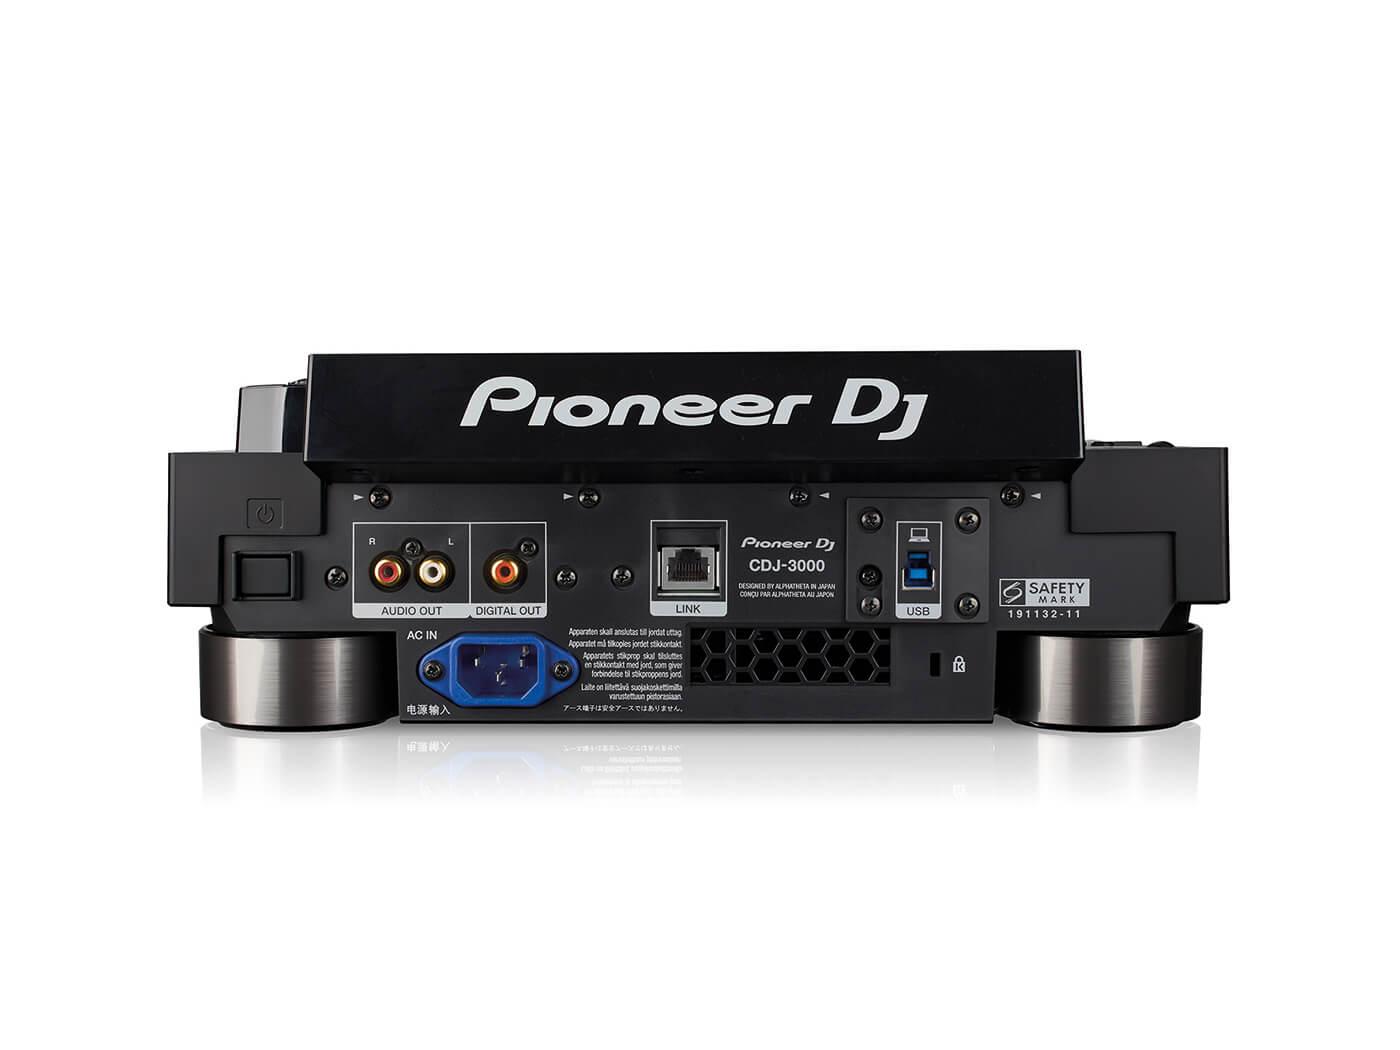 CDJ 3000 BACK WHITE@1400x1050 - Pioneer CDJ-3000 Evaluate